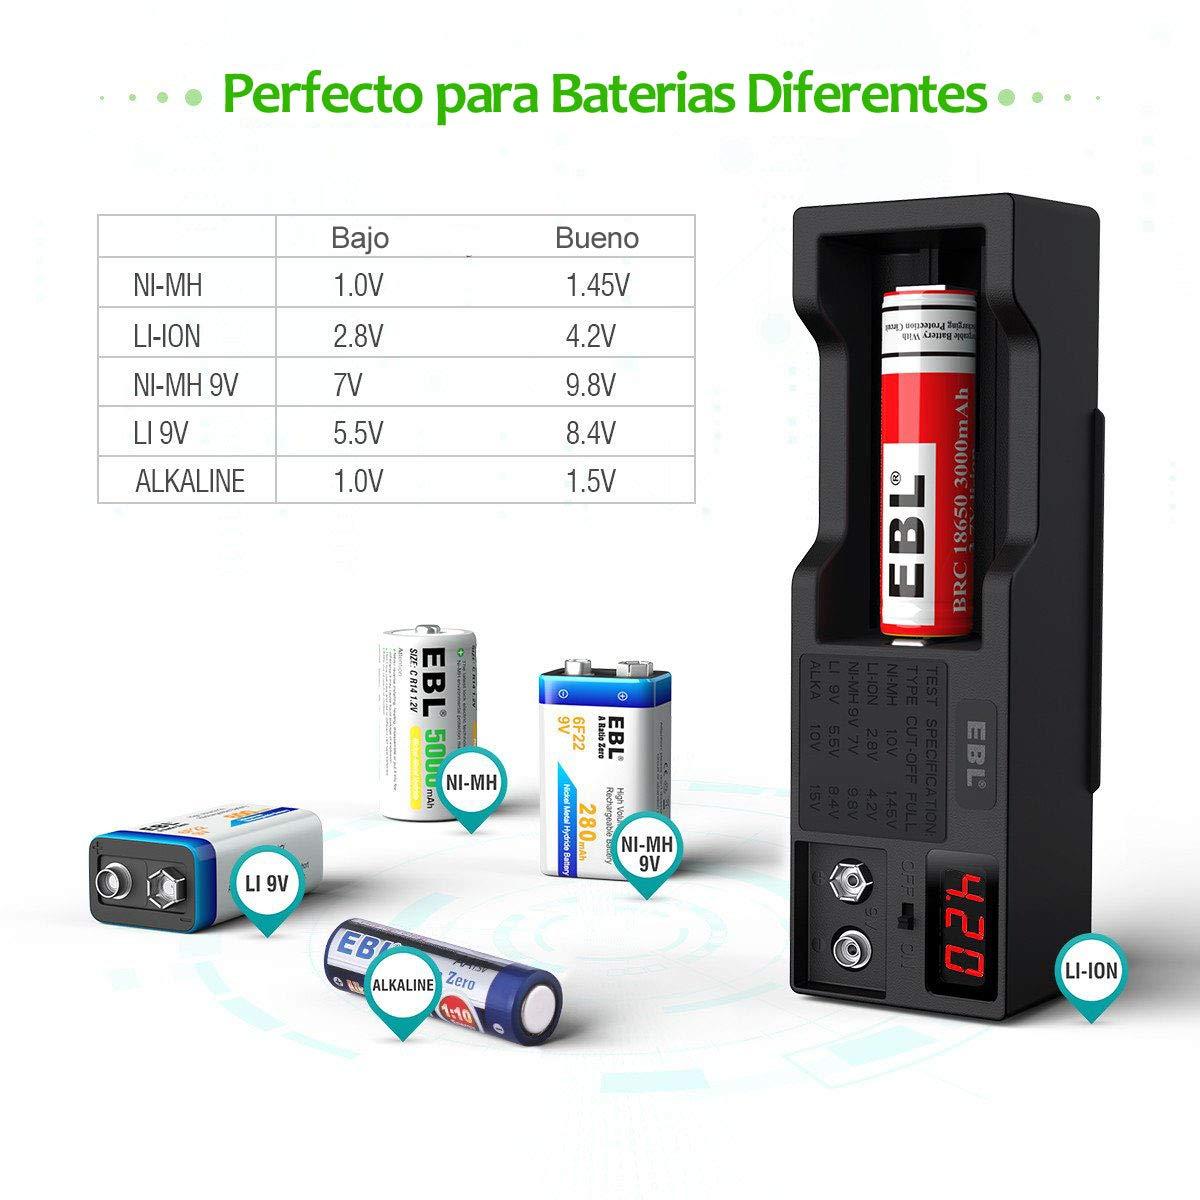 30 mm f//3,5 5,6 Zoom PD RX100 III RX100 IV RX100 y Nikon 1 NIKKOR VR 10 RX100 II PROfoto.Trend//Kiwifotos Adaptador de Filtros para Sony Cyber-shot DSC-RX100 V